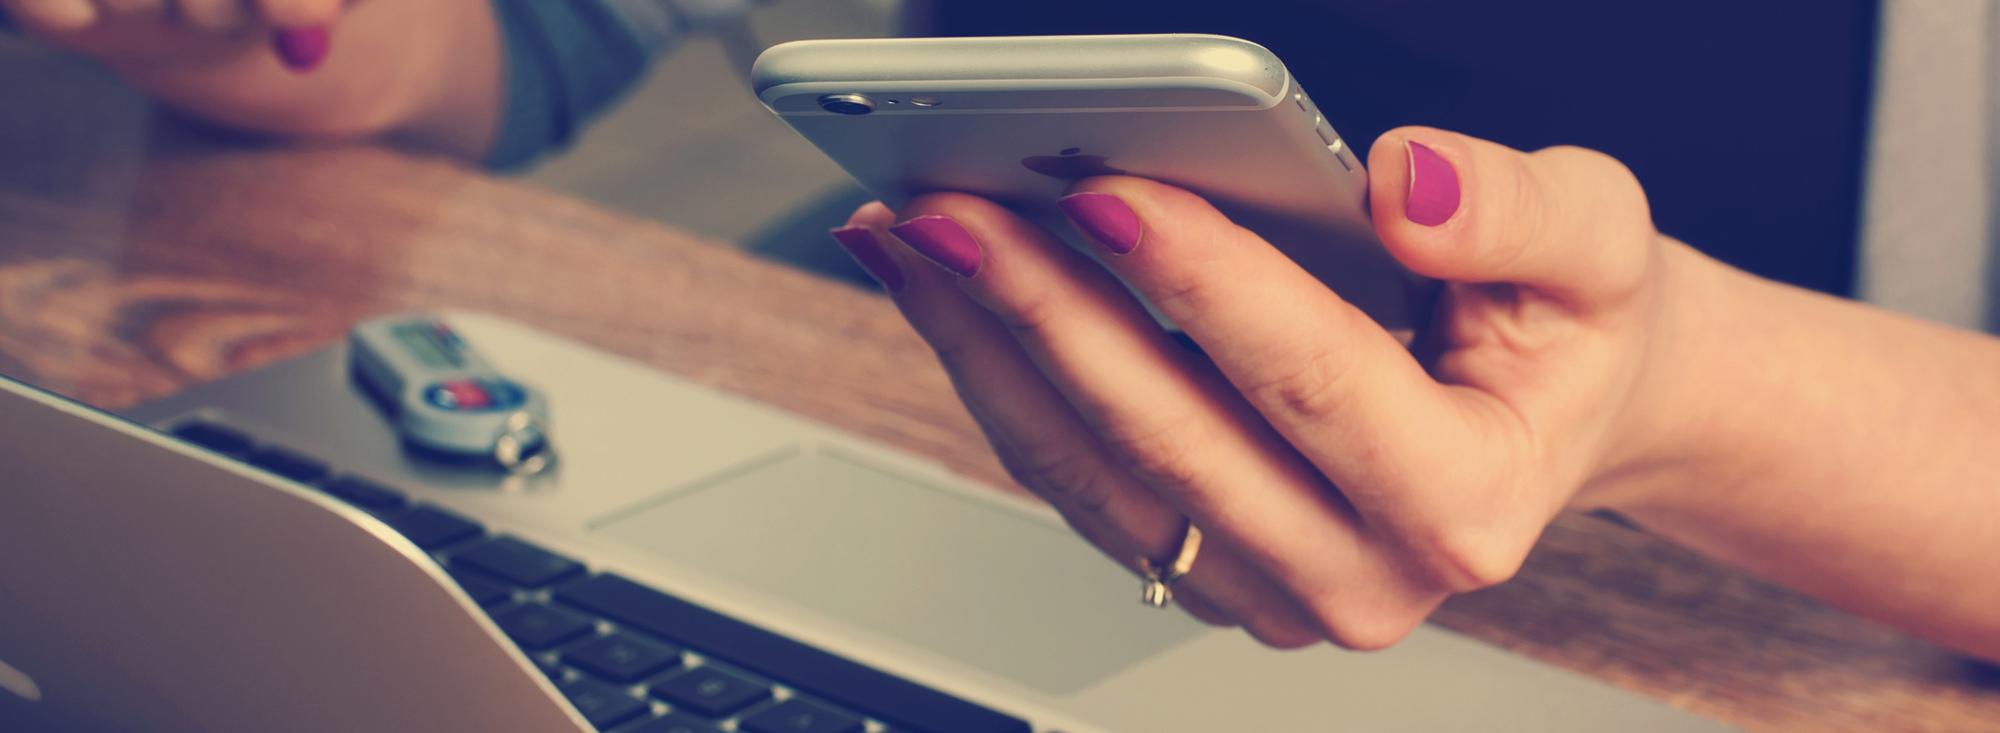 Let's stop talking about digital disruption